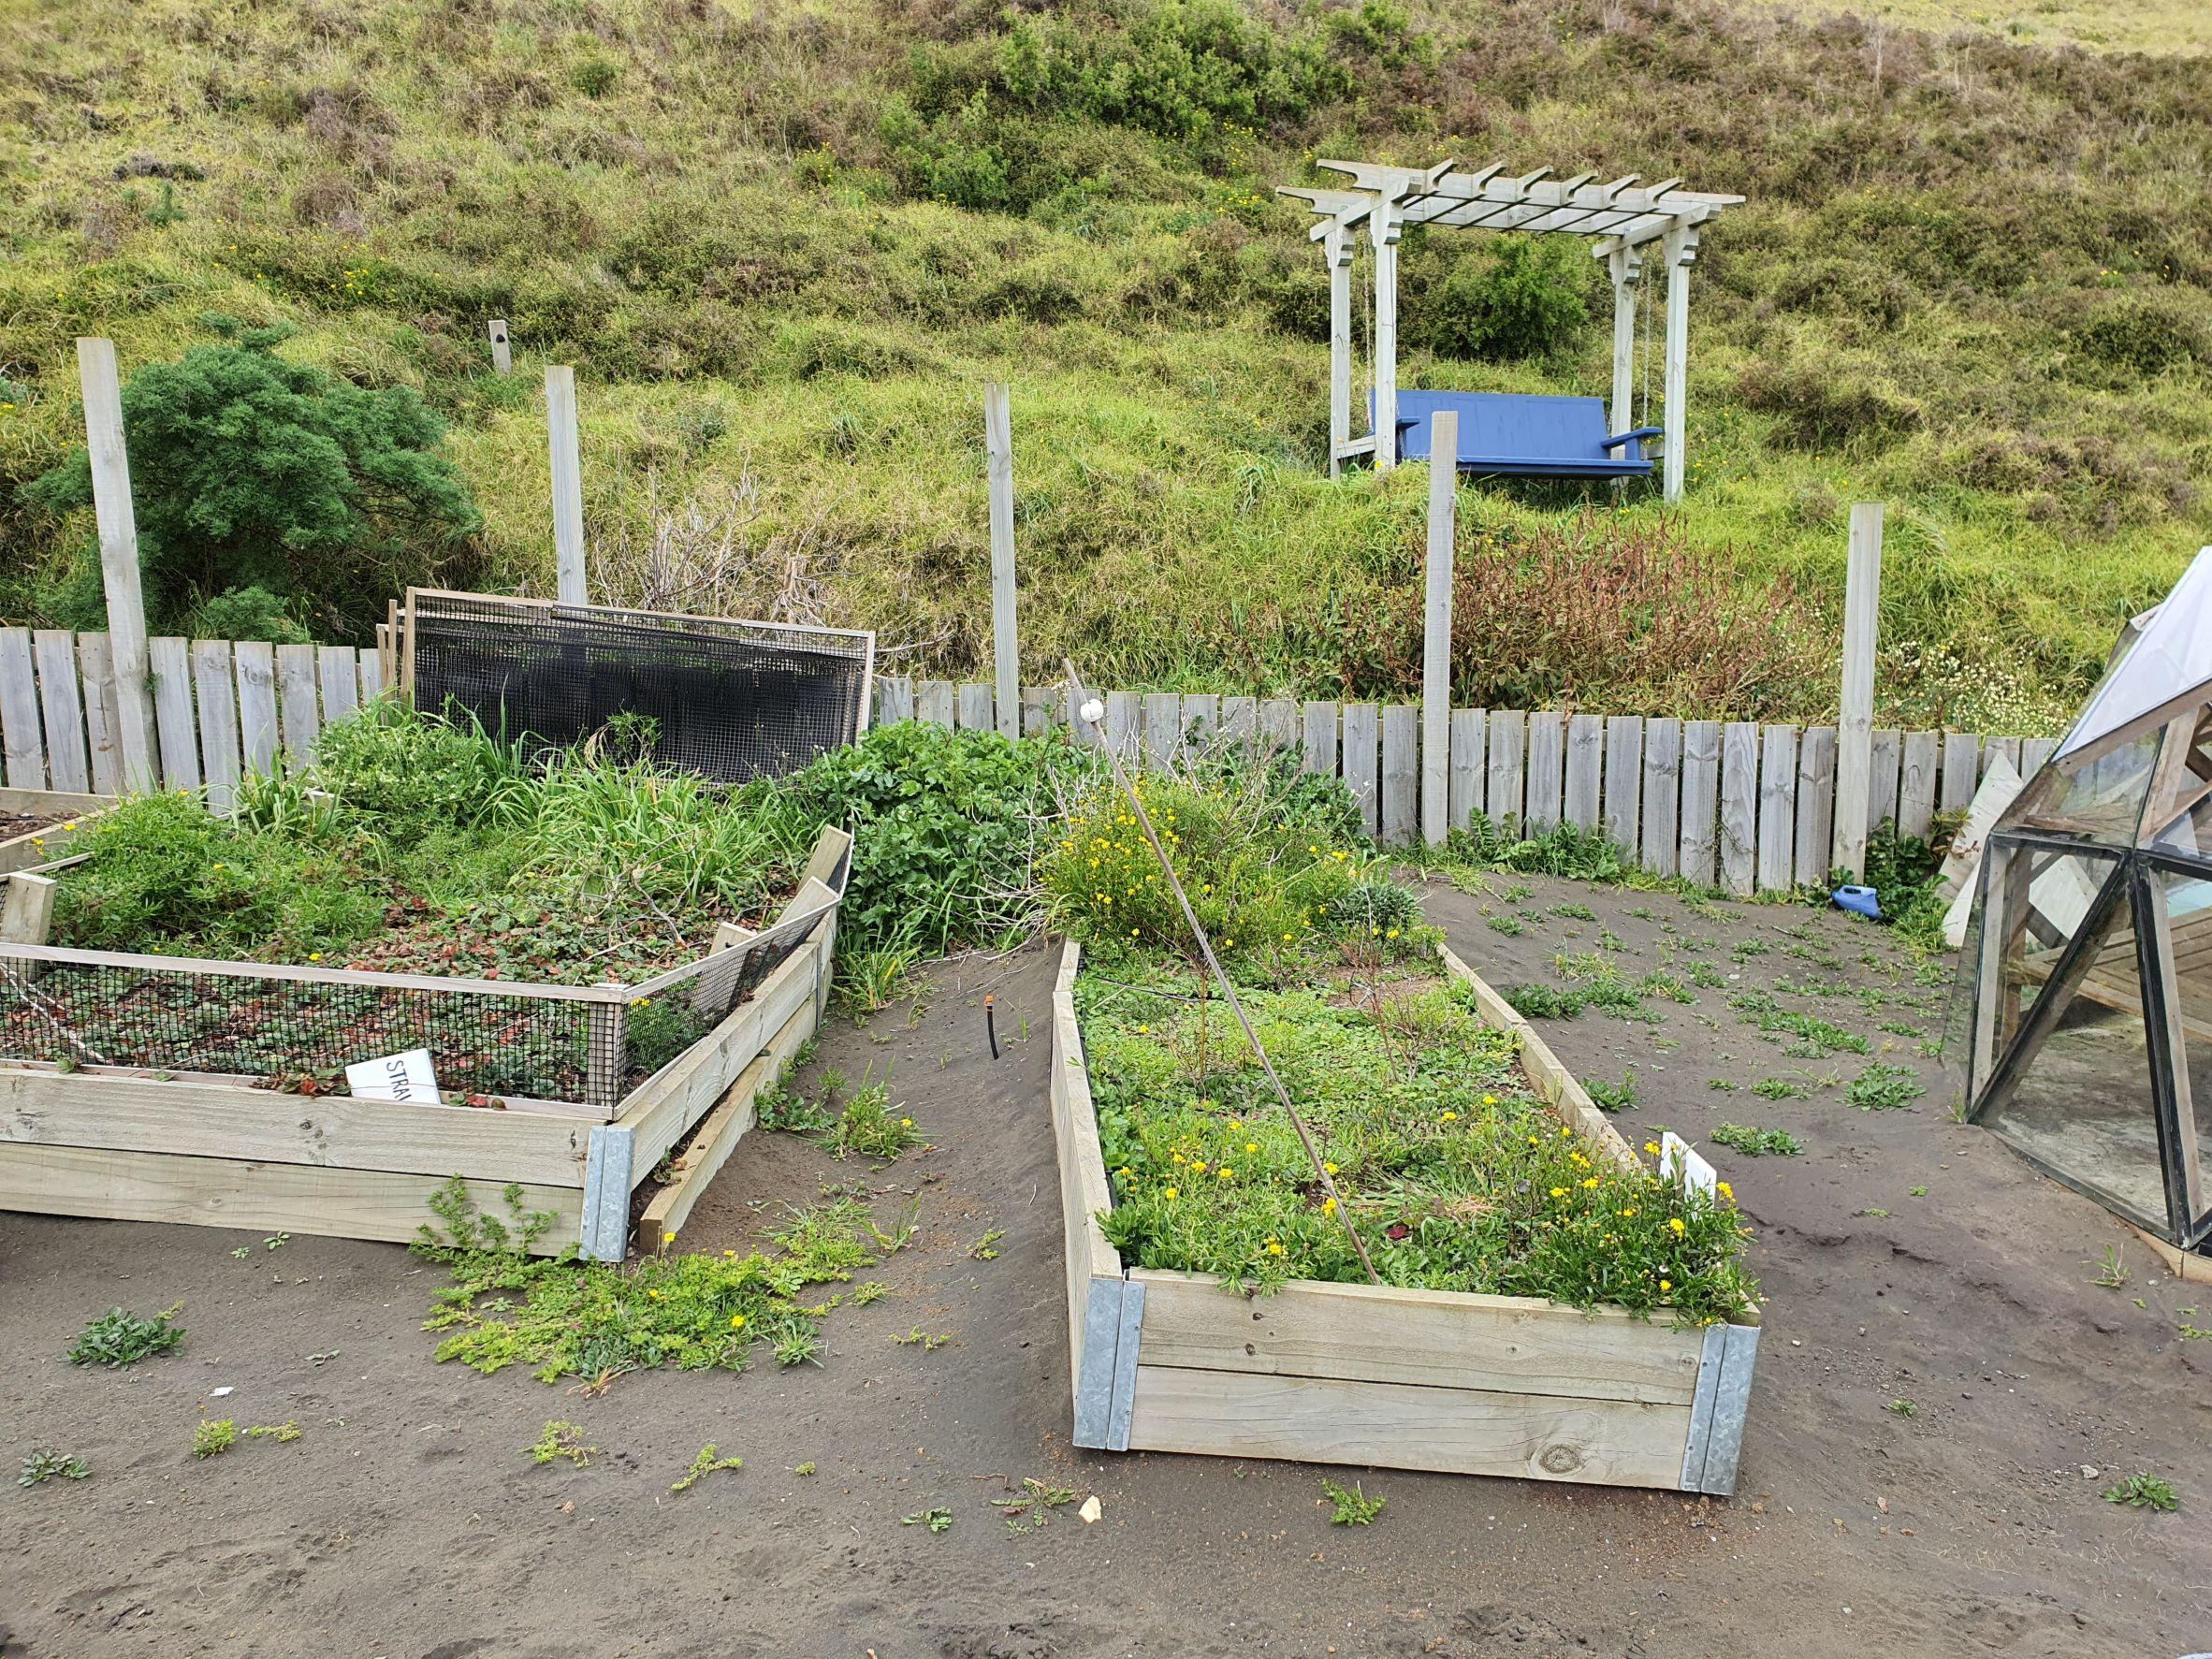 garden area in need of maintenance